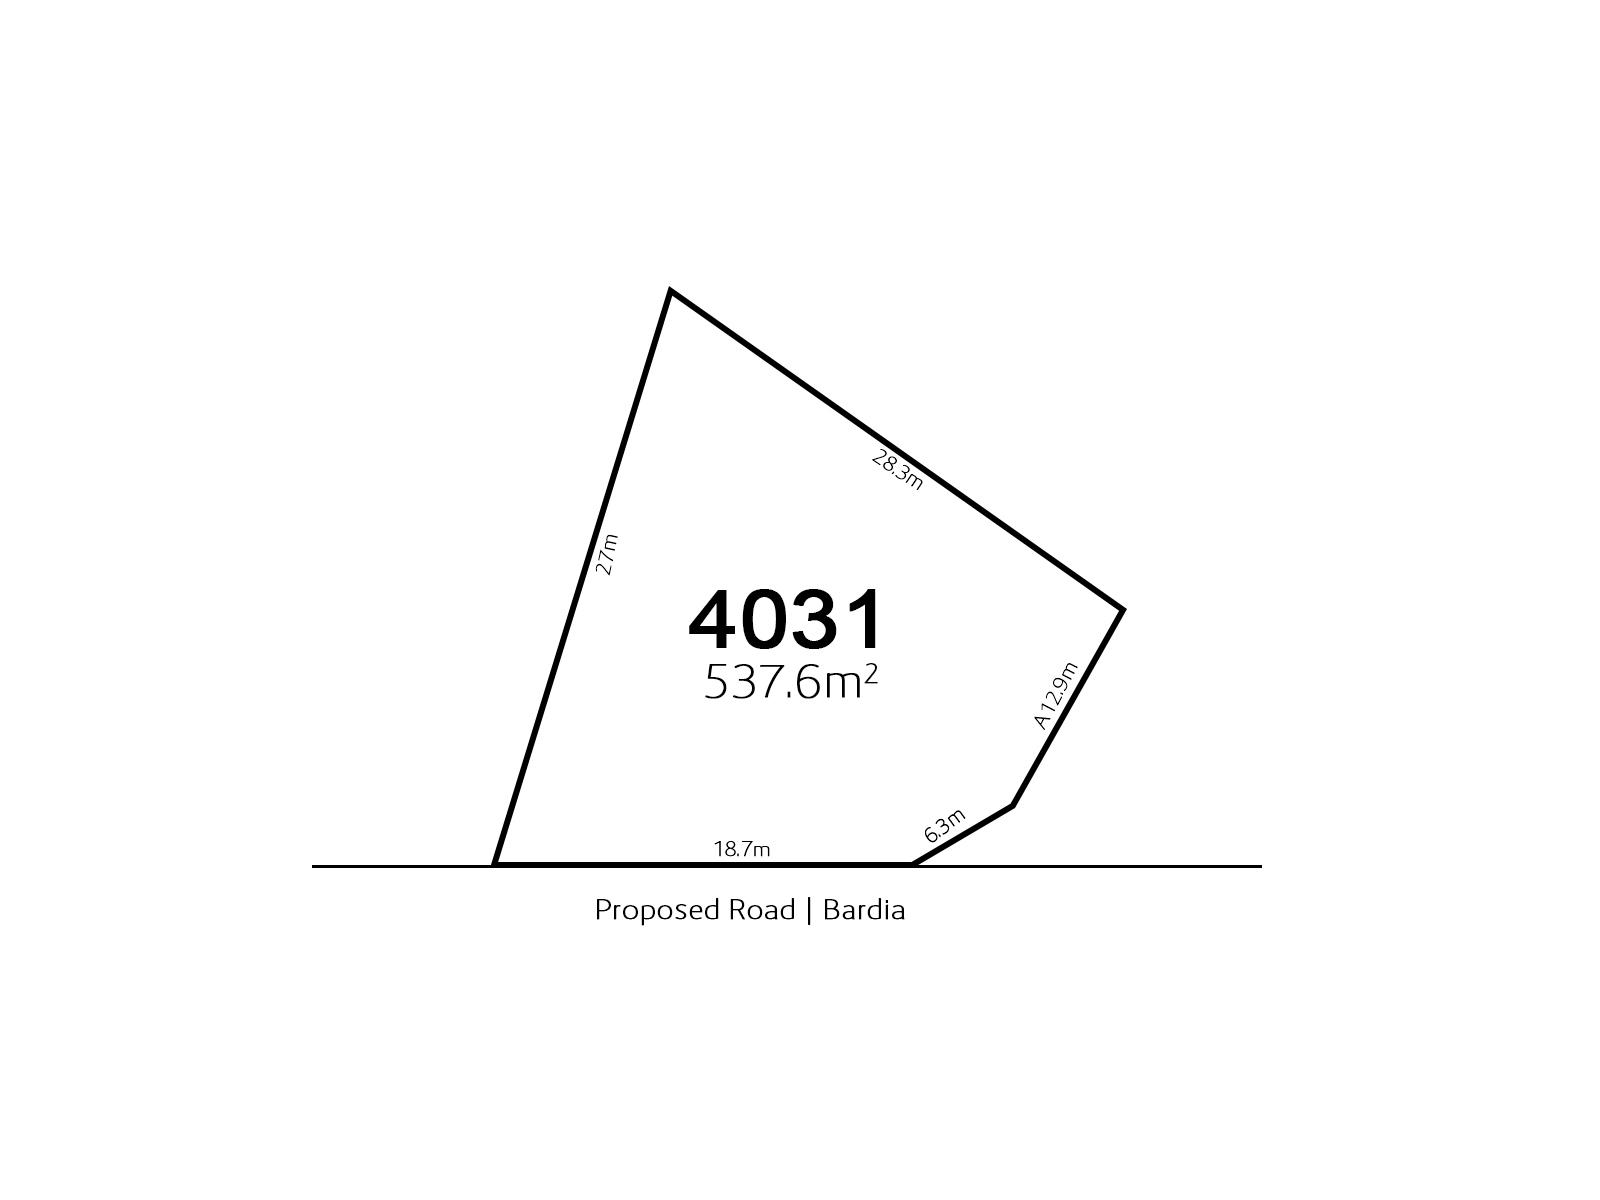 Bardia LOT 4031 Proposed Road | Bardia